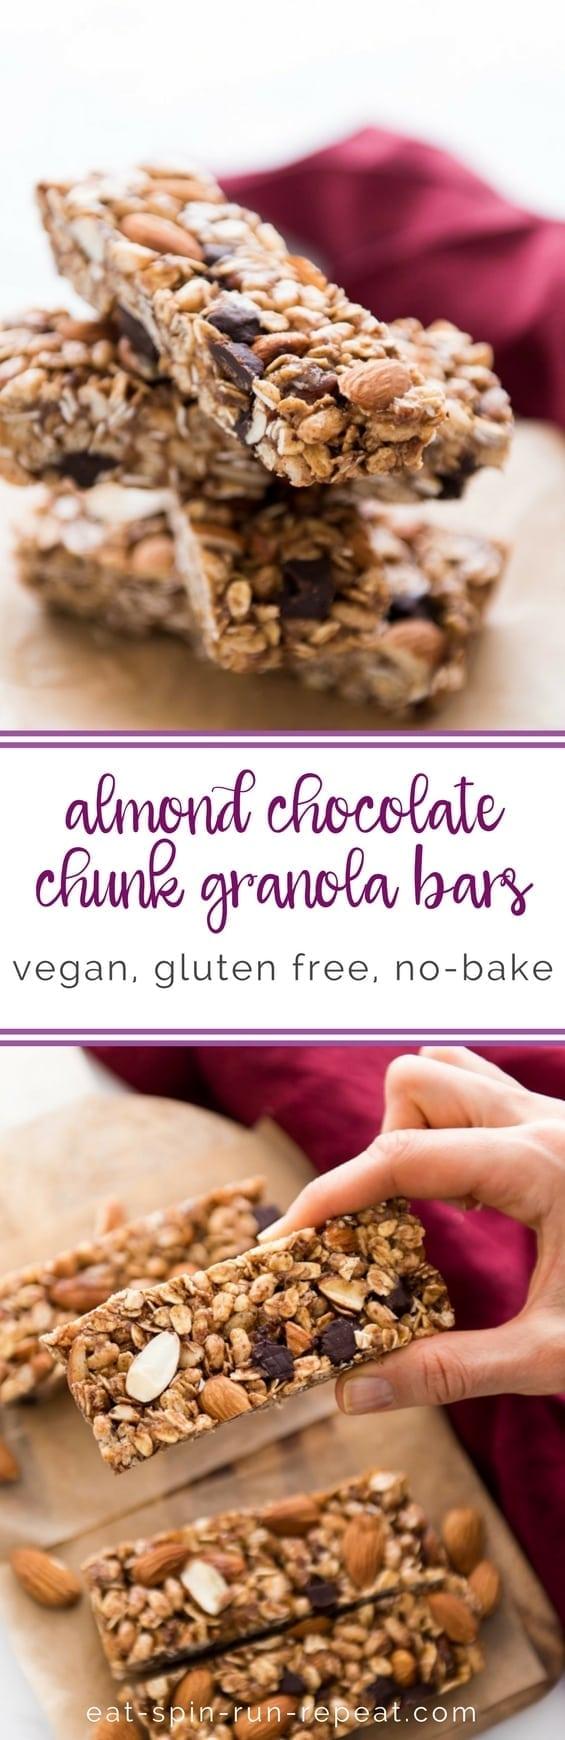 No-Bake Almond Chocolate Chunk Granola Bars || #vegan #glutenfree || Eat Spin Run Repeat